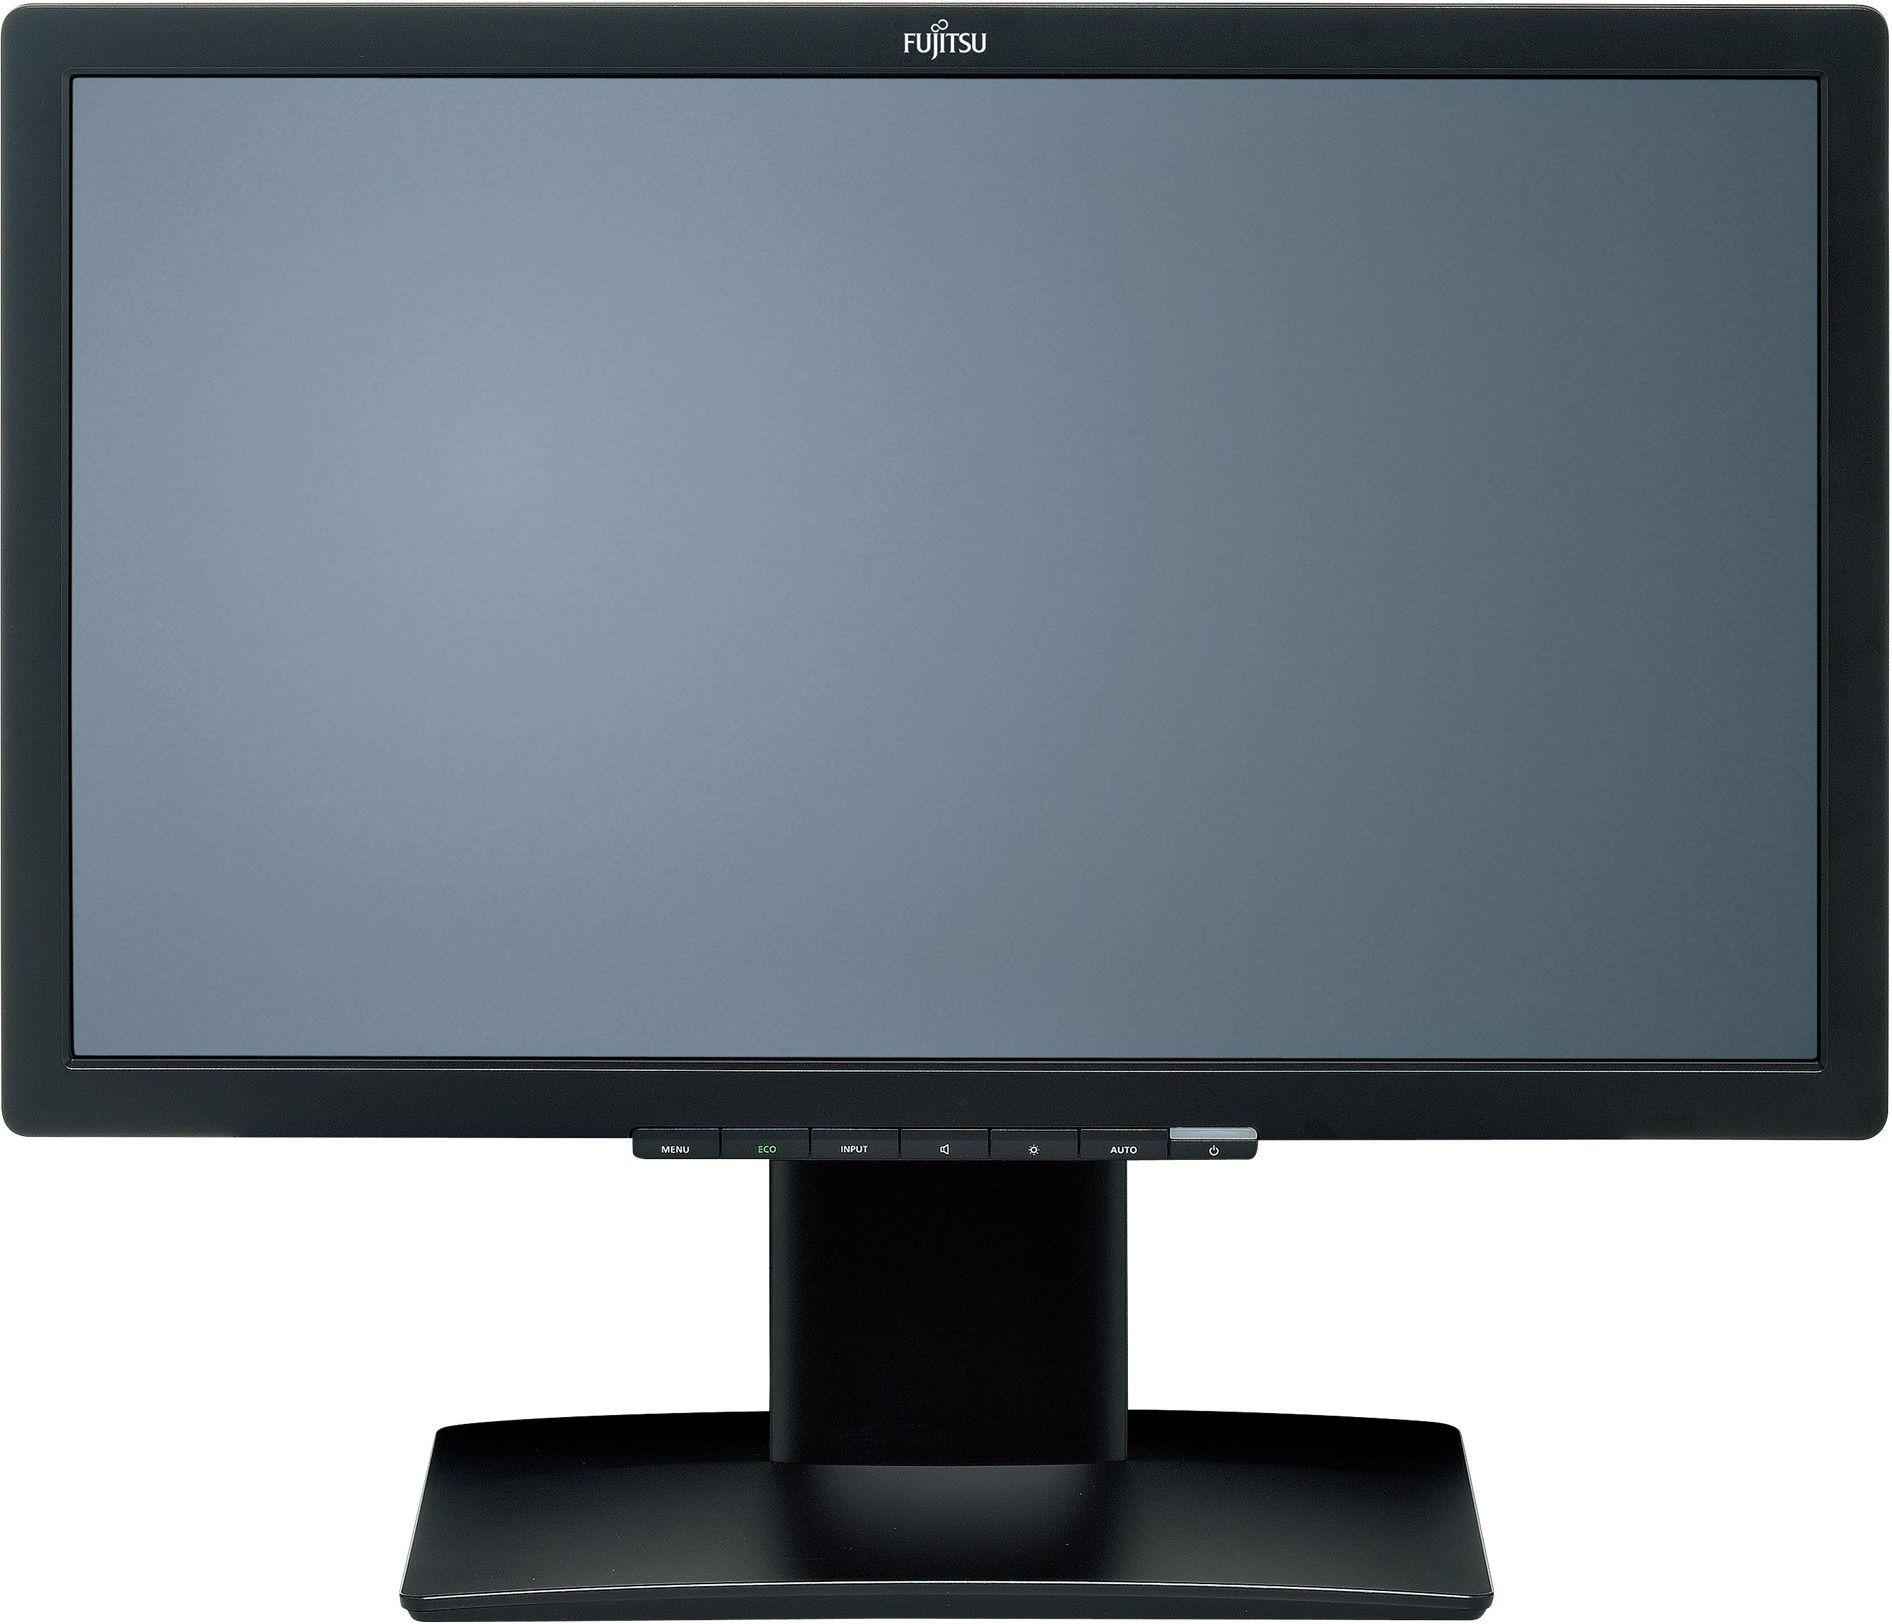 monitor fujitsu b22t 7 led progreen 22 zoll 1920x1080 5ms. Black Bedroom Furniture Sets. Home Design Ideas